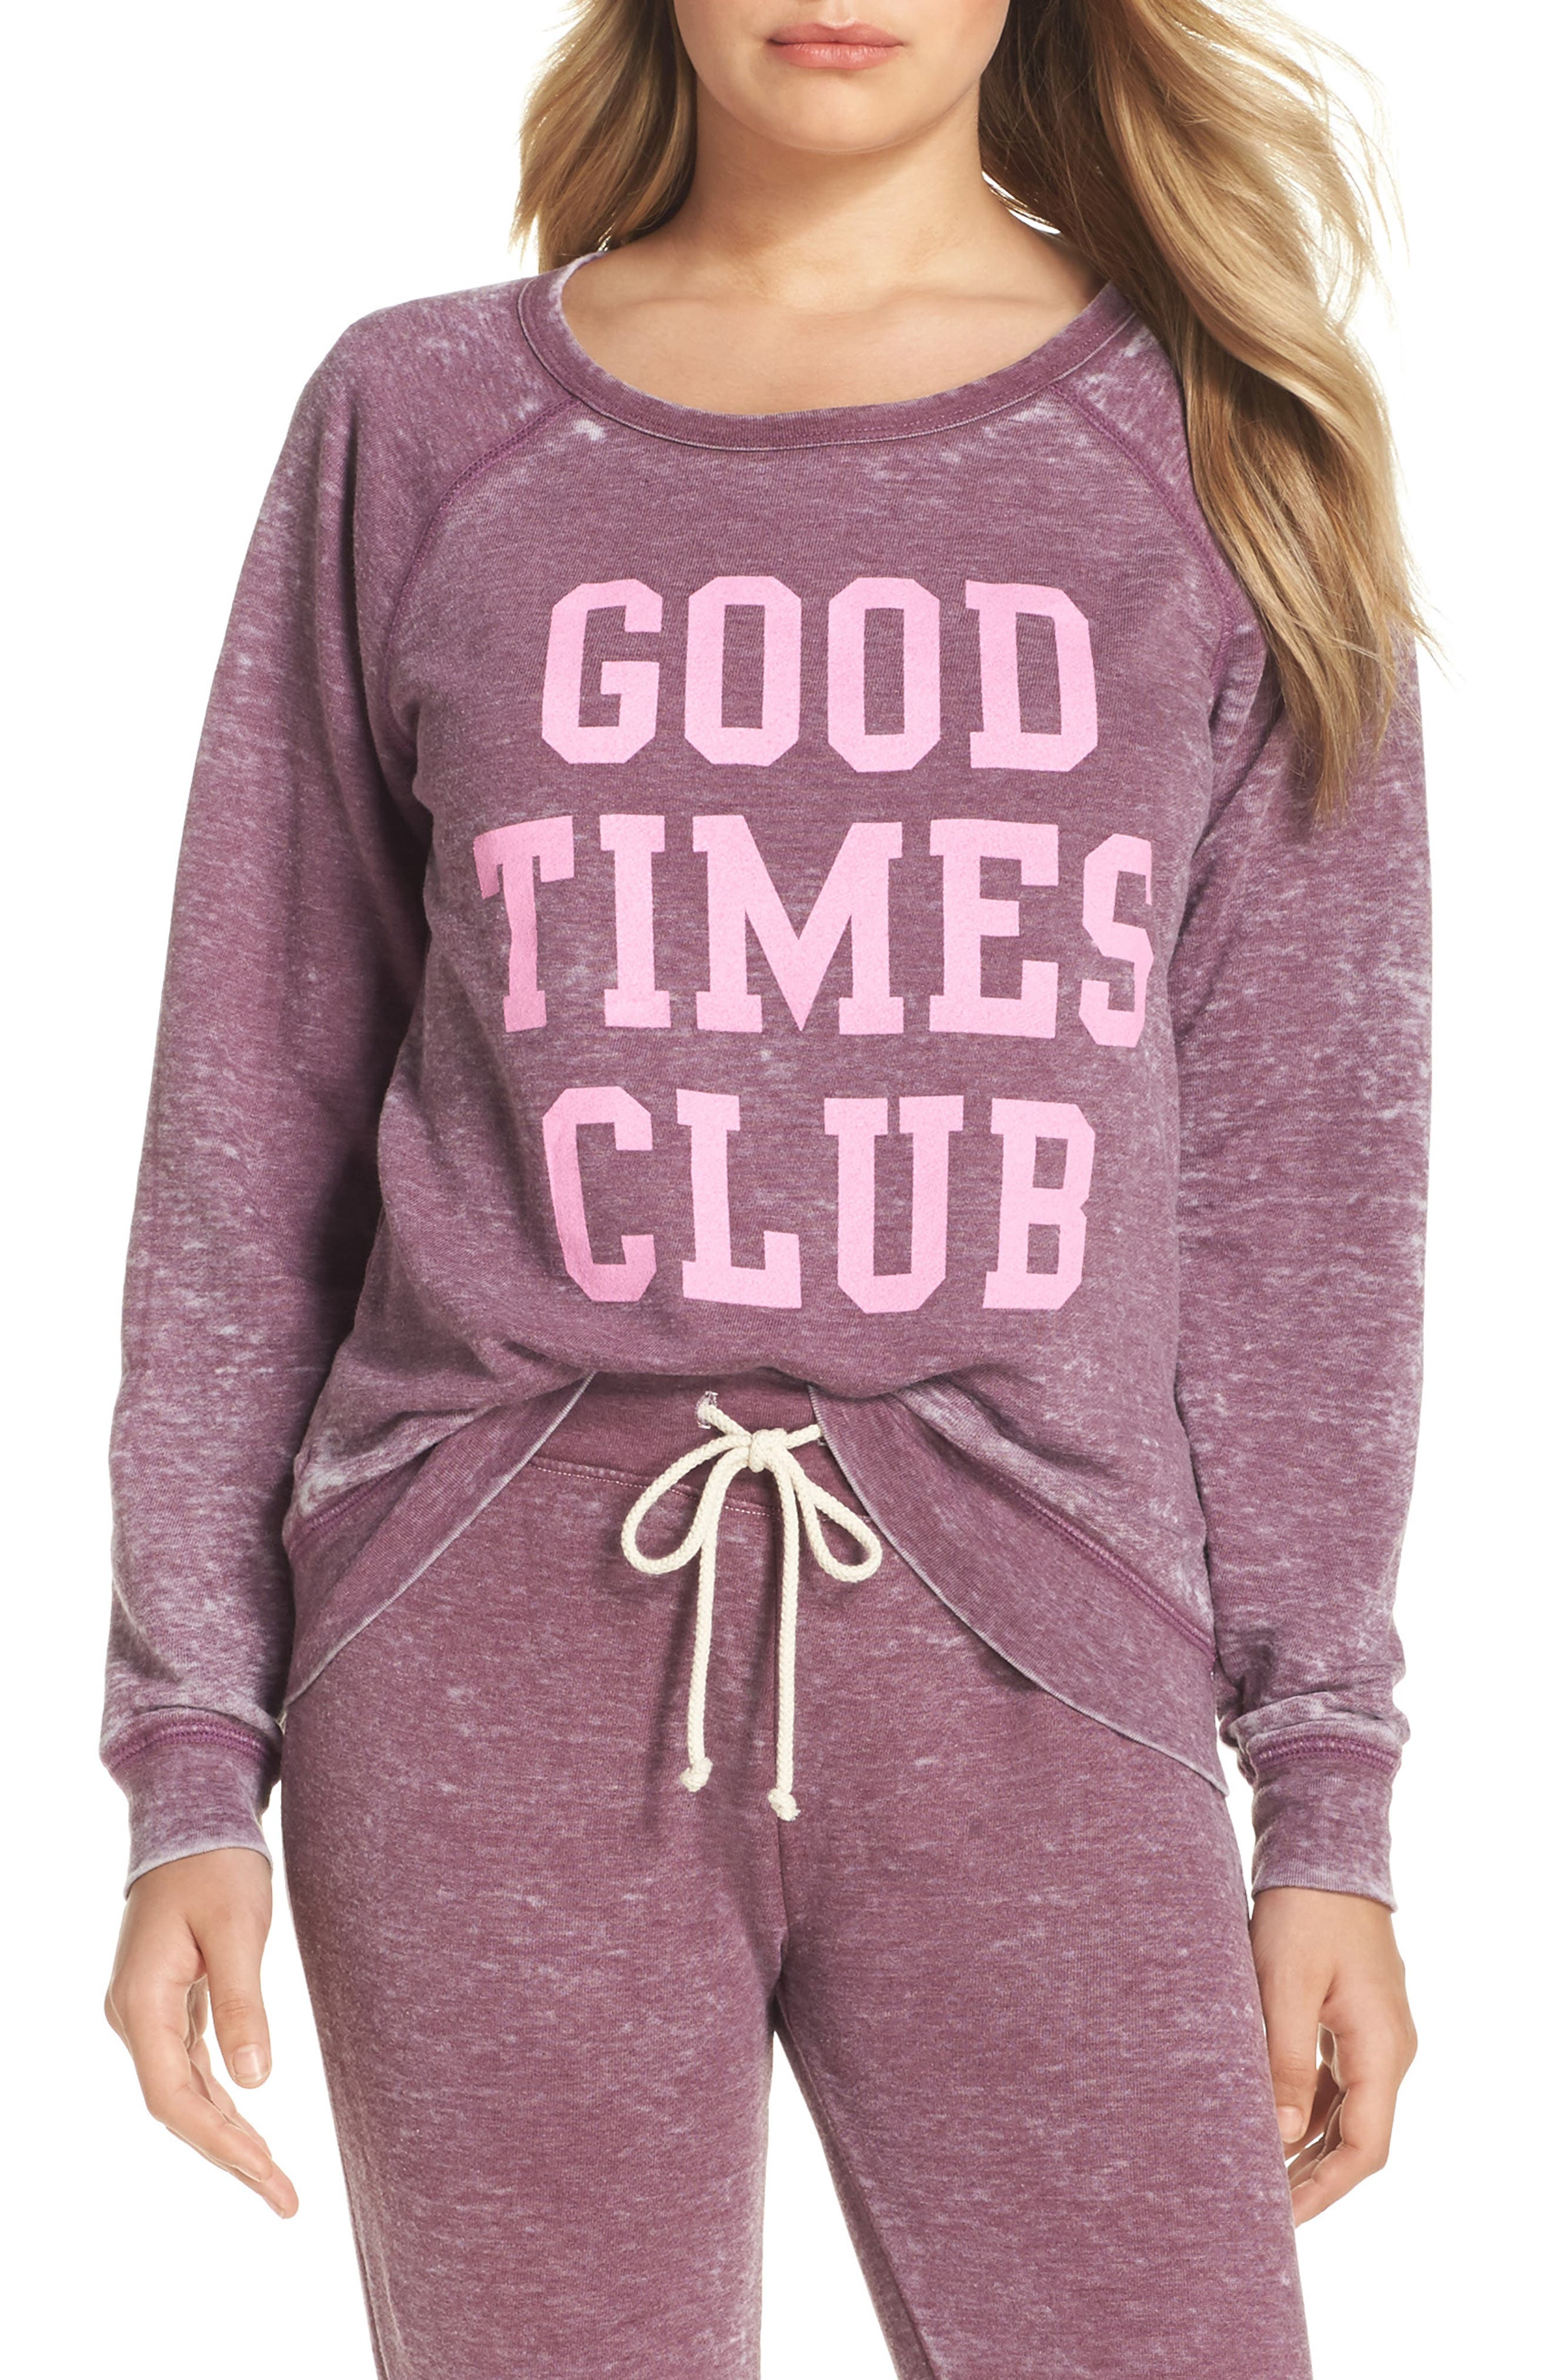 Junk Food Weekend - Good Times Club Pullover